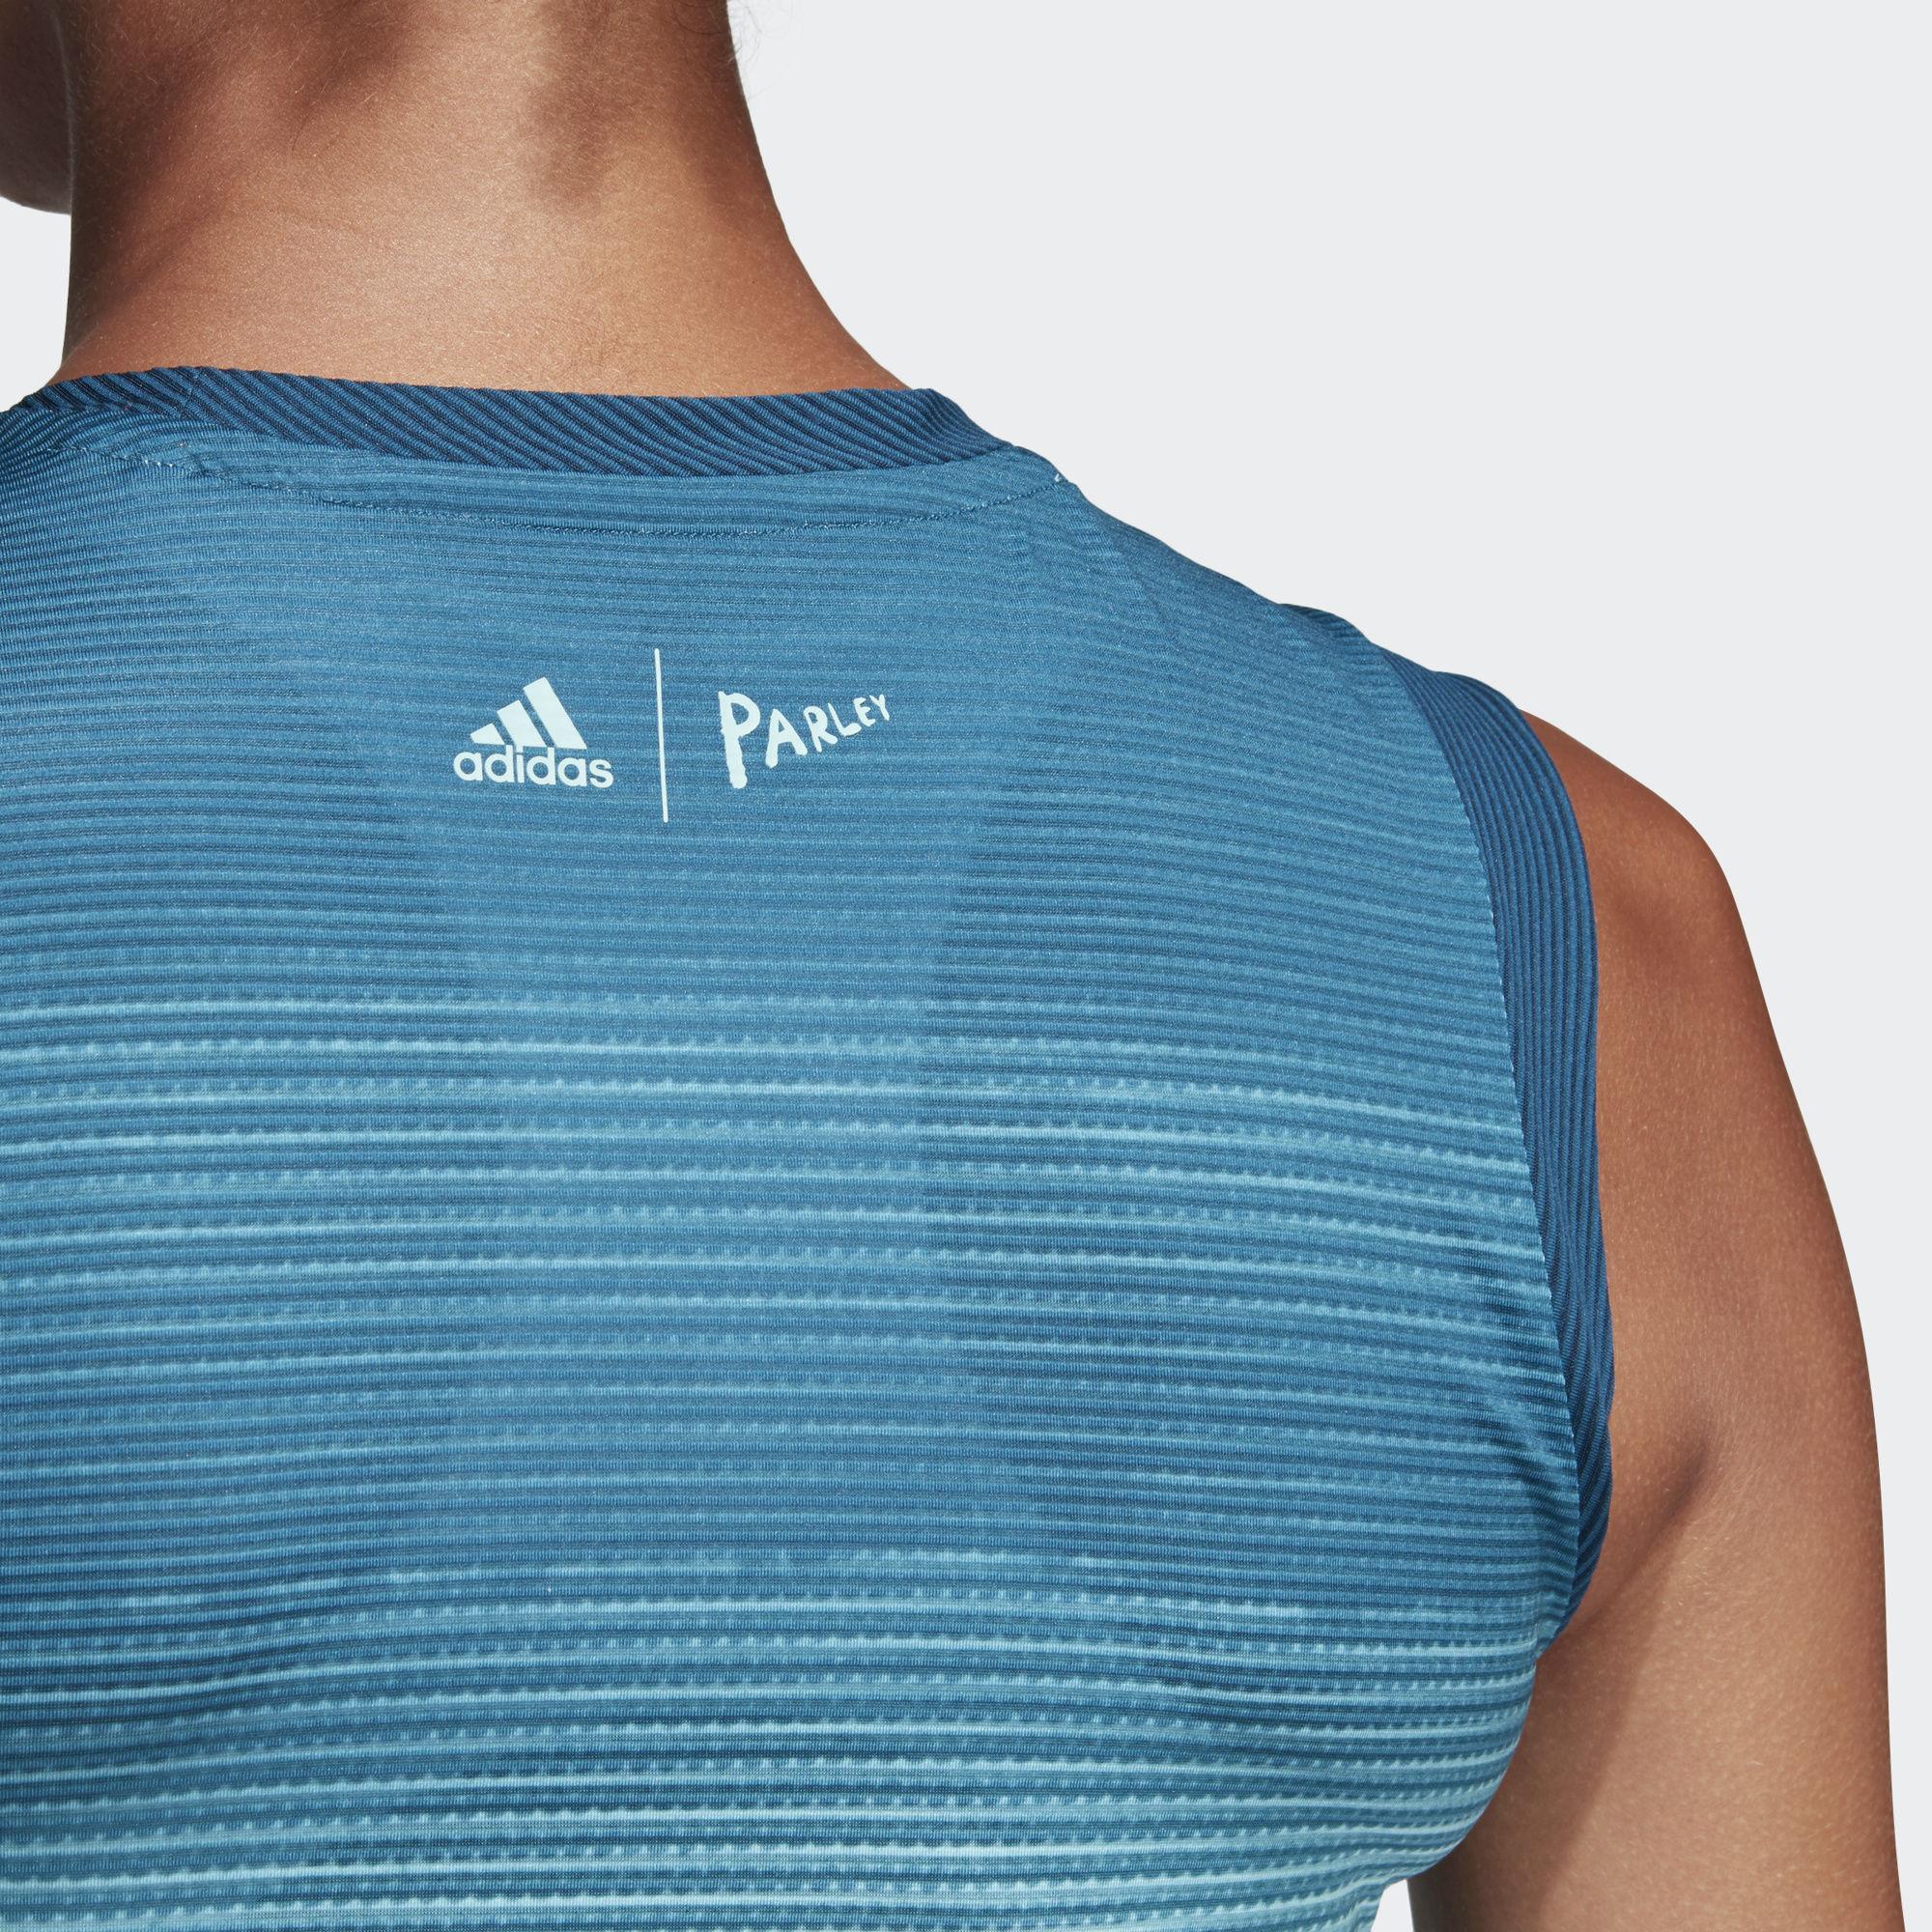 0de7bd0918c Adidas Womens Parley Tank - Blue Spirit/White - Tennisnuts.com